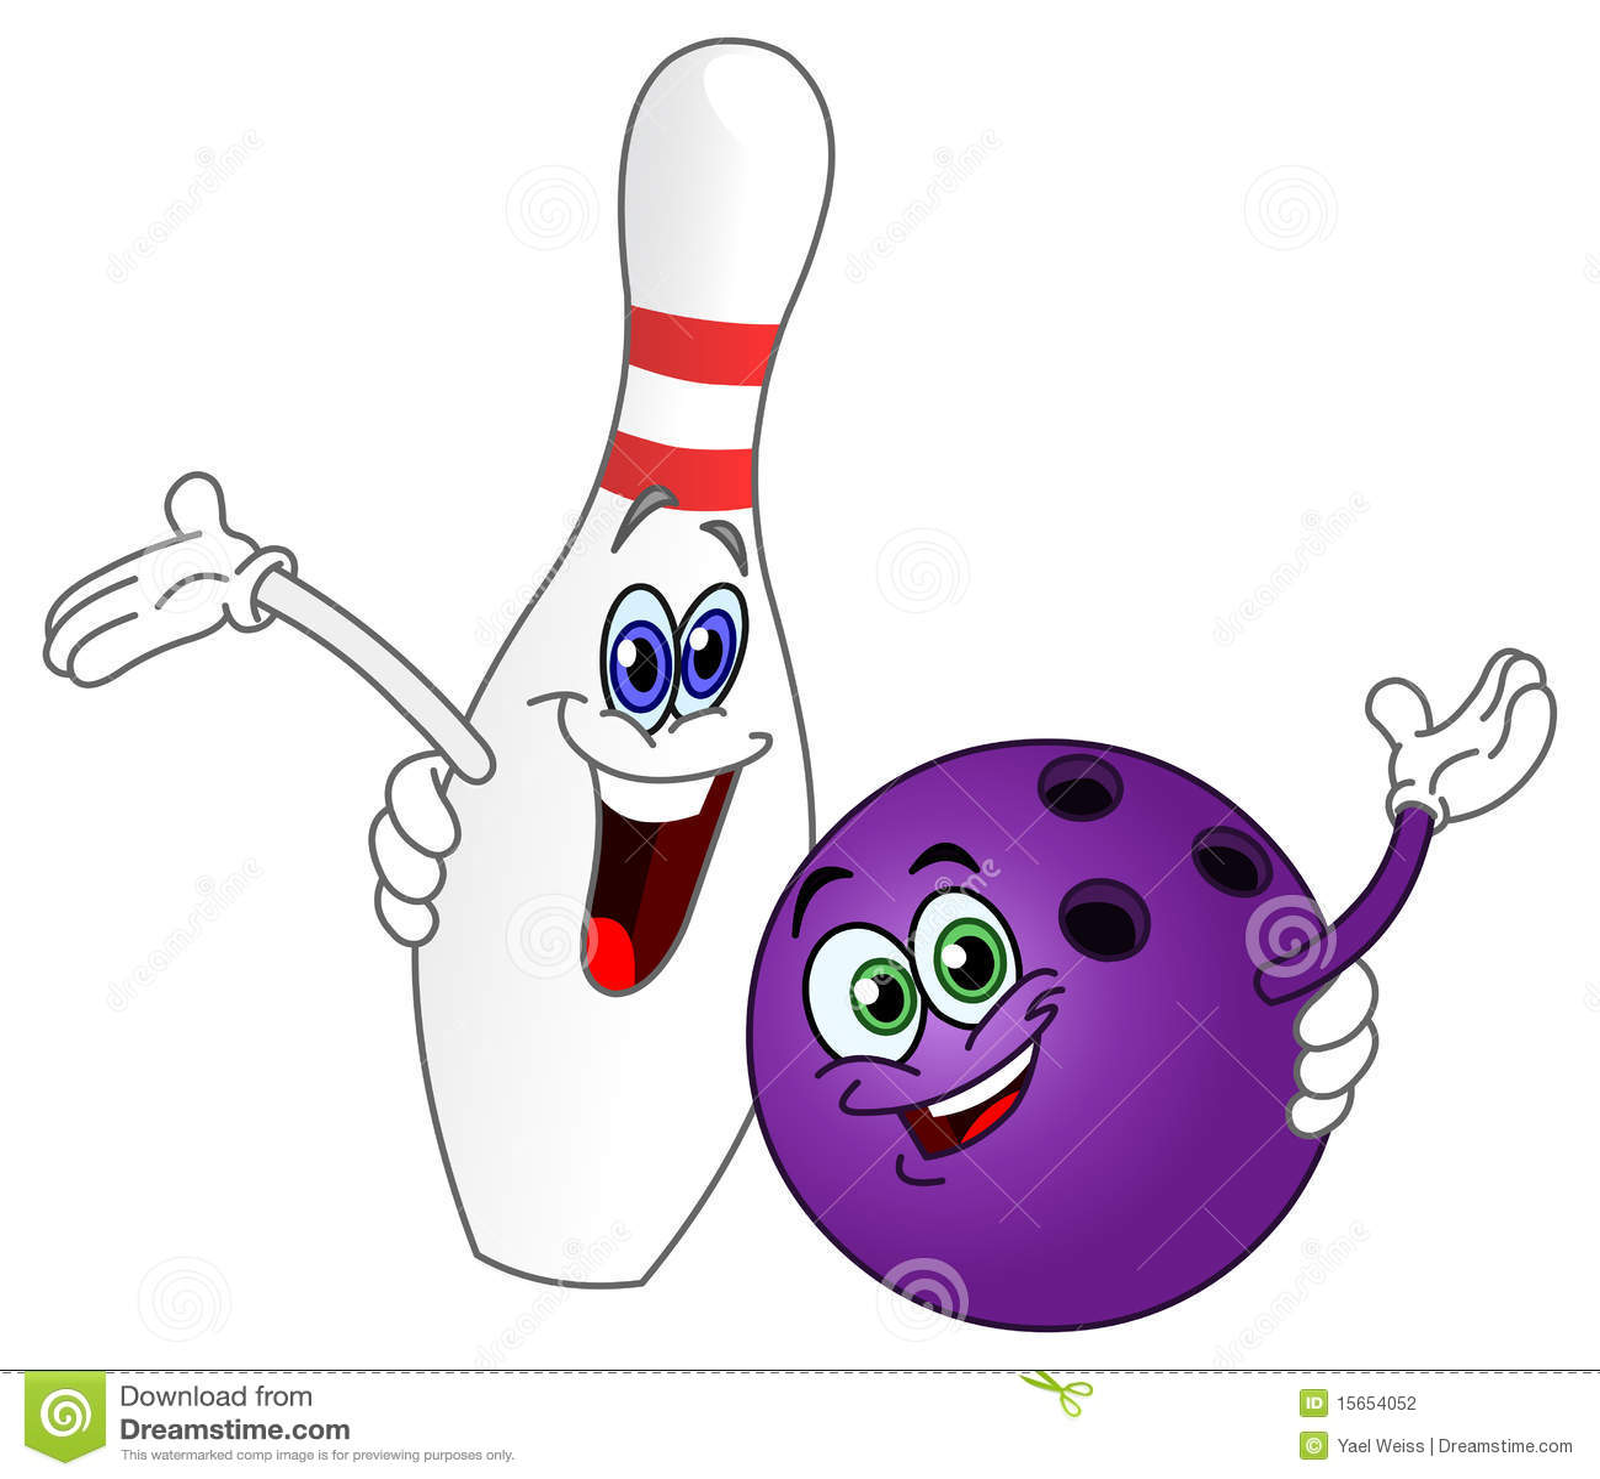 Congratulate, bowling cartoon pin spank apologise, but